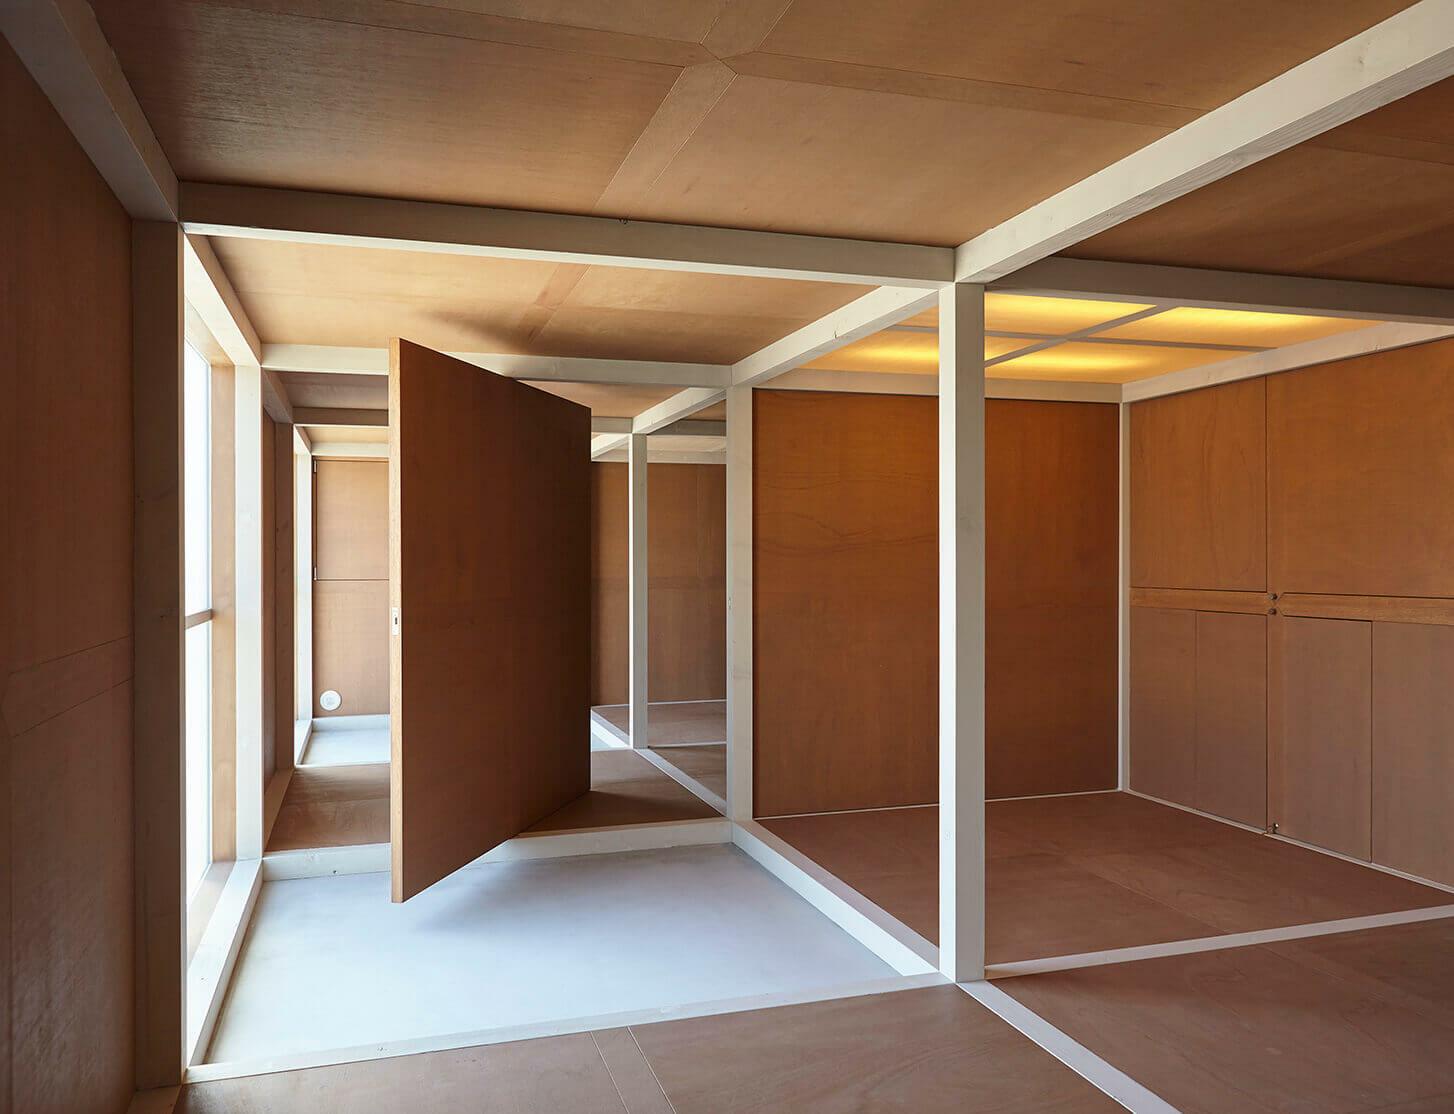 Hotel designed by Jonathan Monk opens in Okayama, Japan